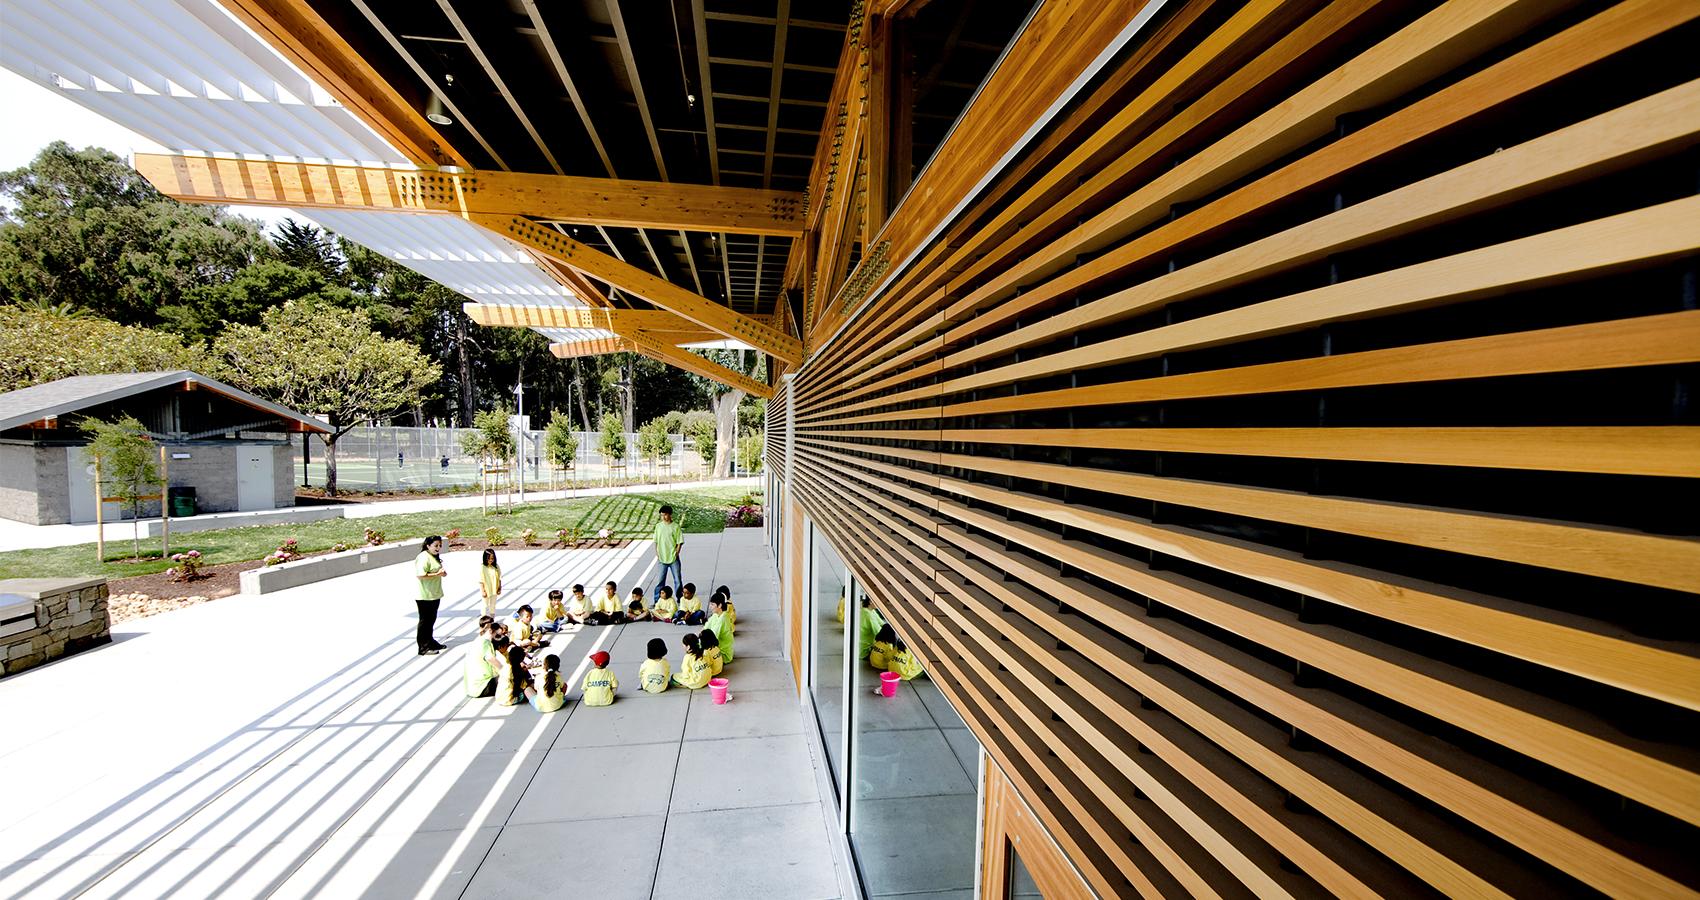 Publication_Orange Park Recreation Center.jpg